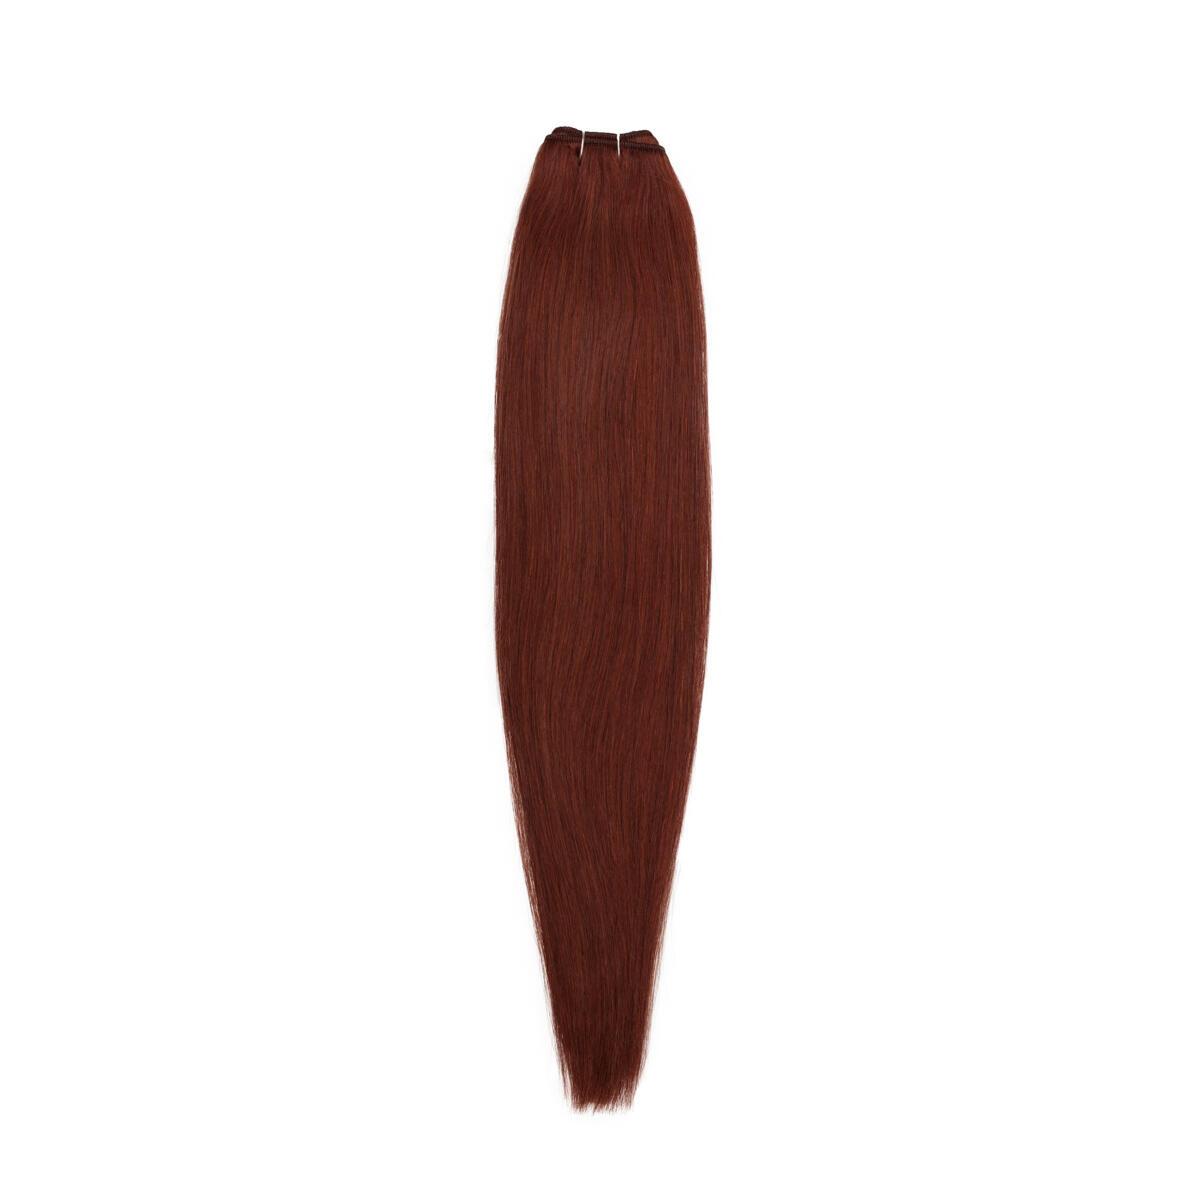 Hair Weft Original 5.5 Mahogany Brown 50 cm